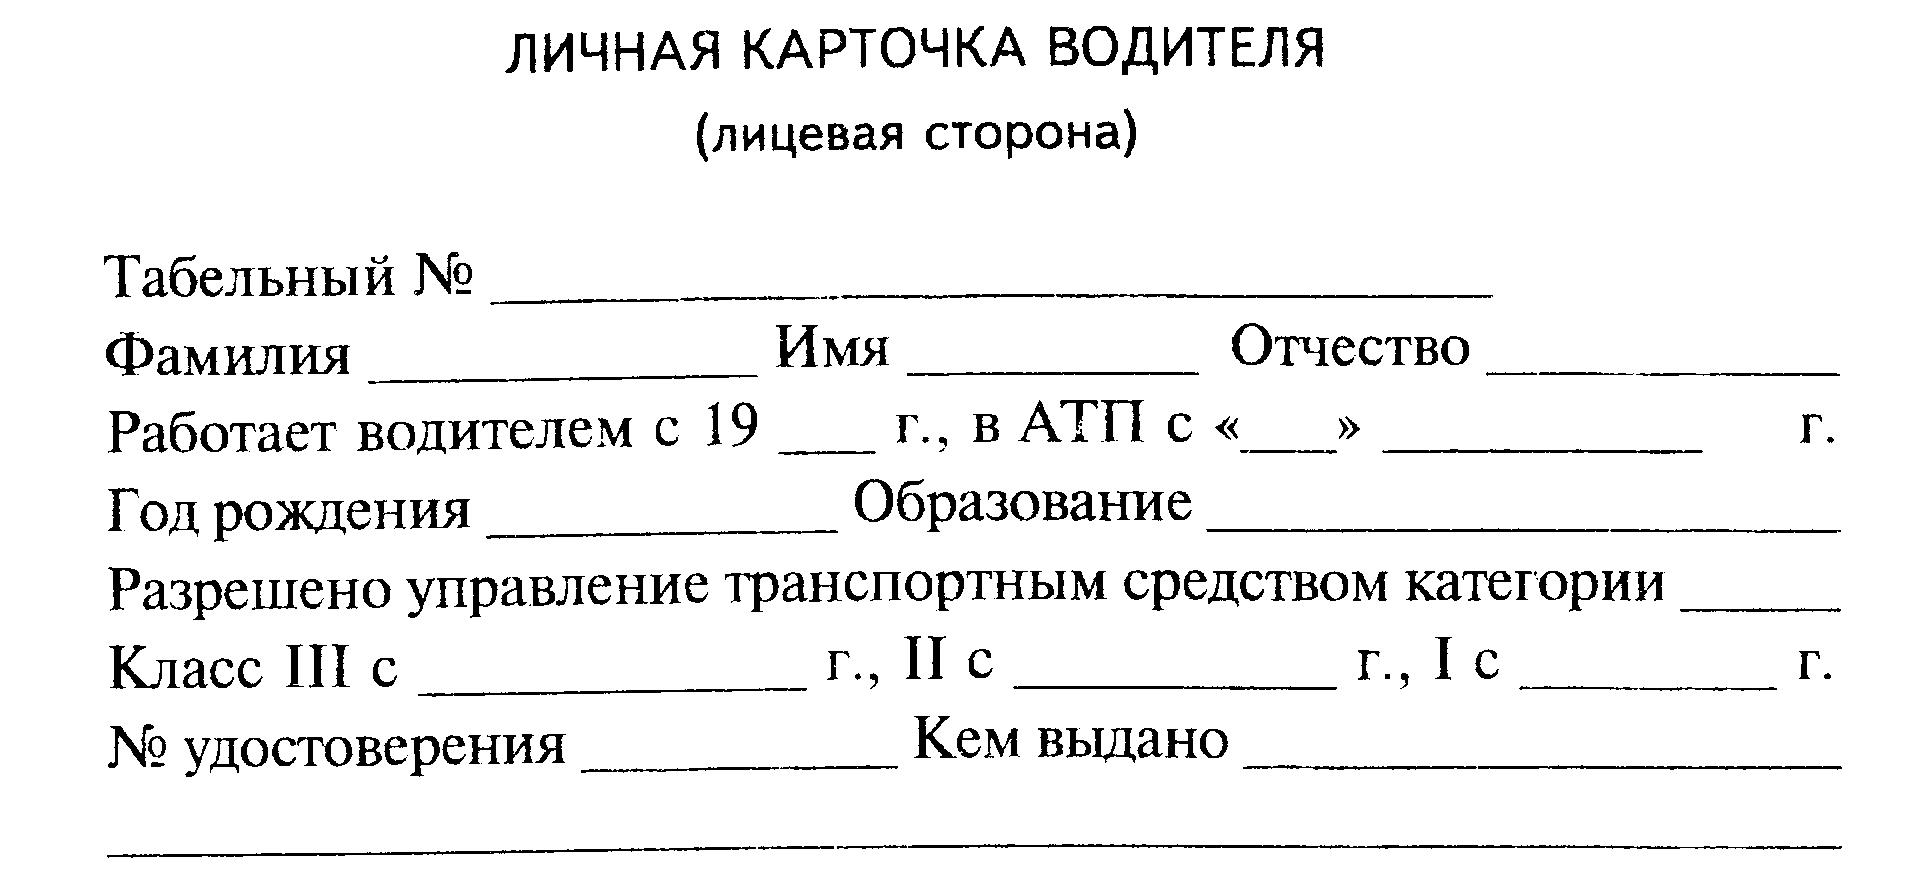 Срок архива документов по бдд в организации